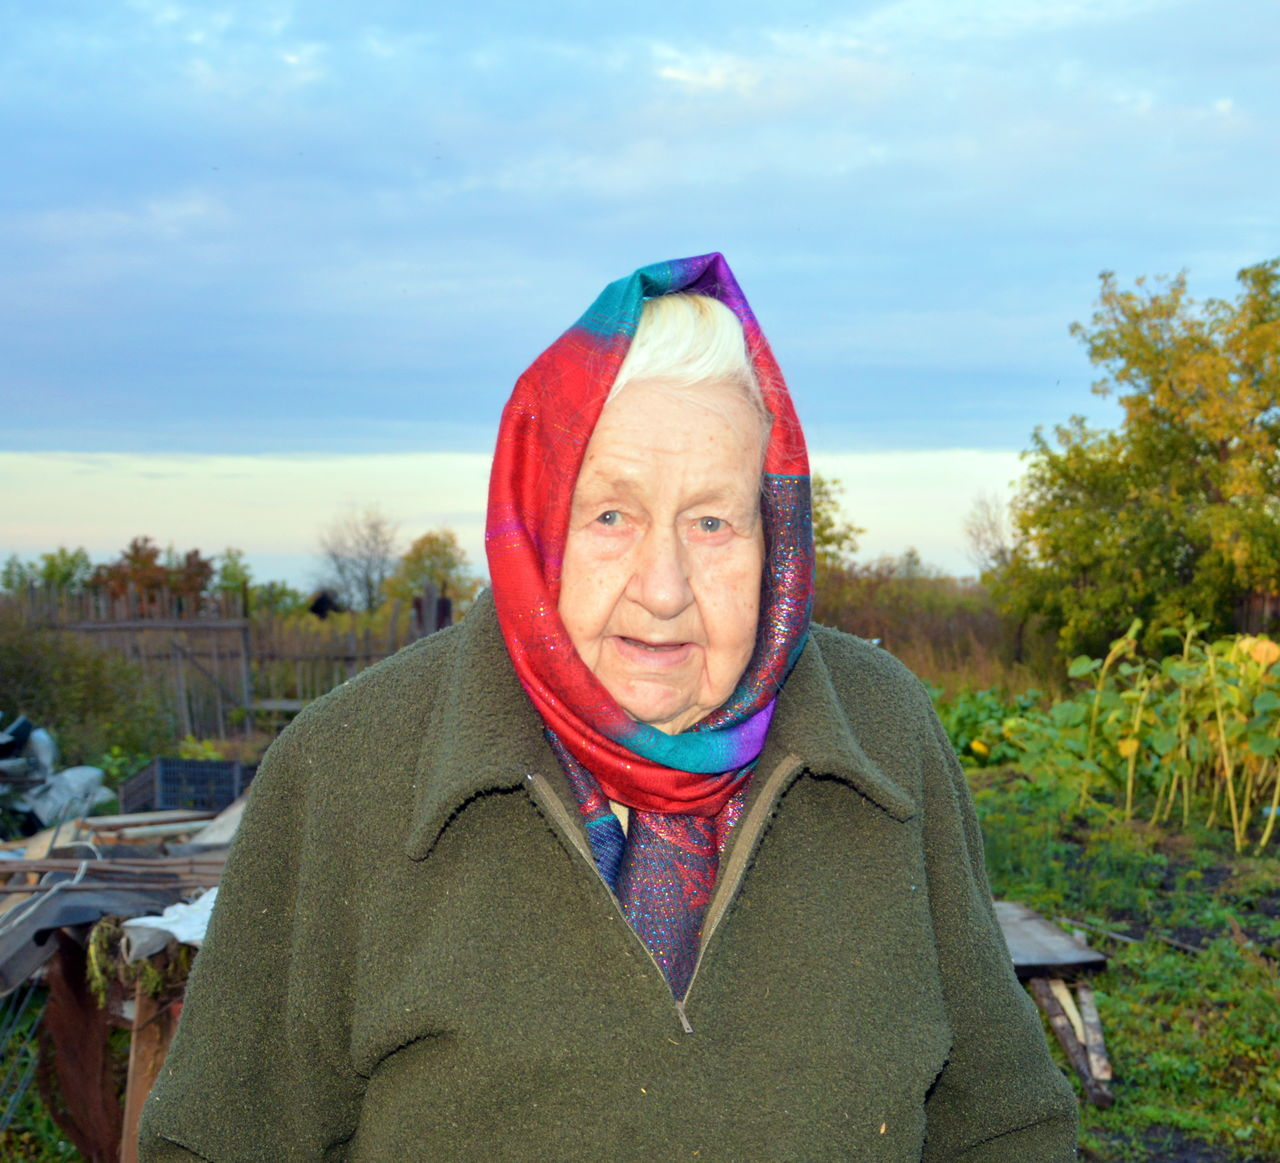 Portrait Of Senior Woman Wearing Headscarf Against Sky